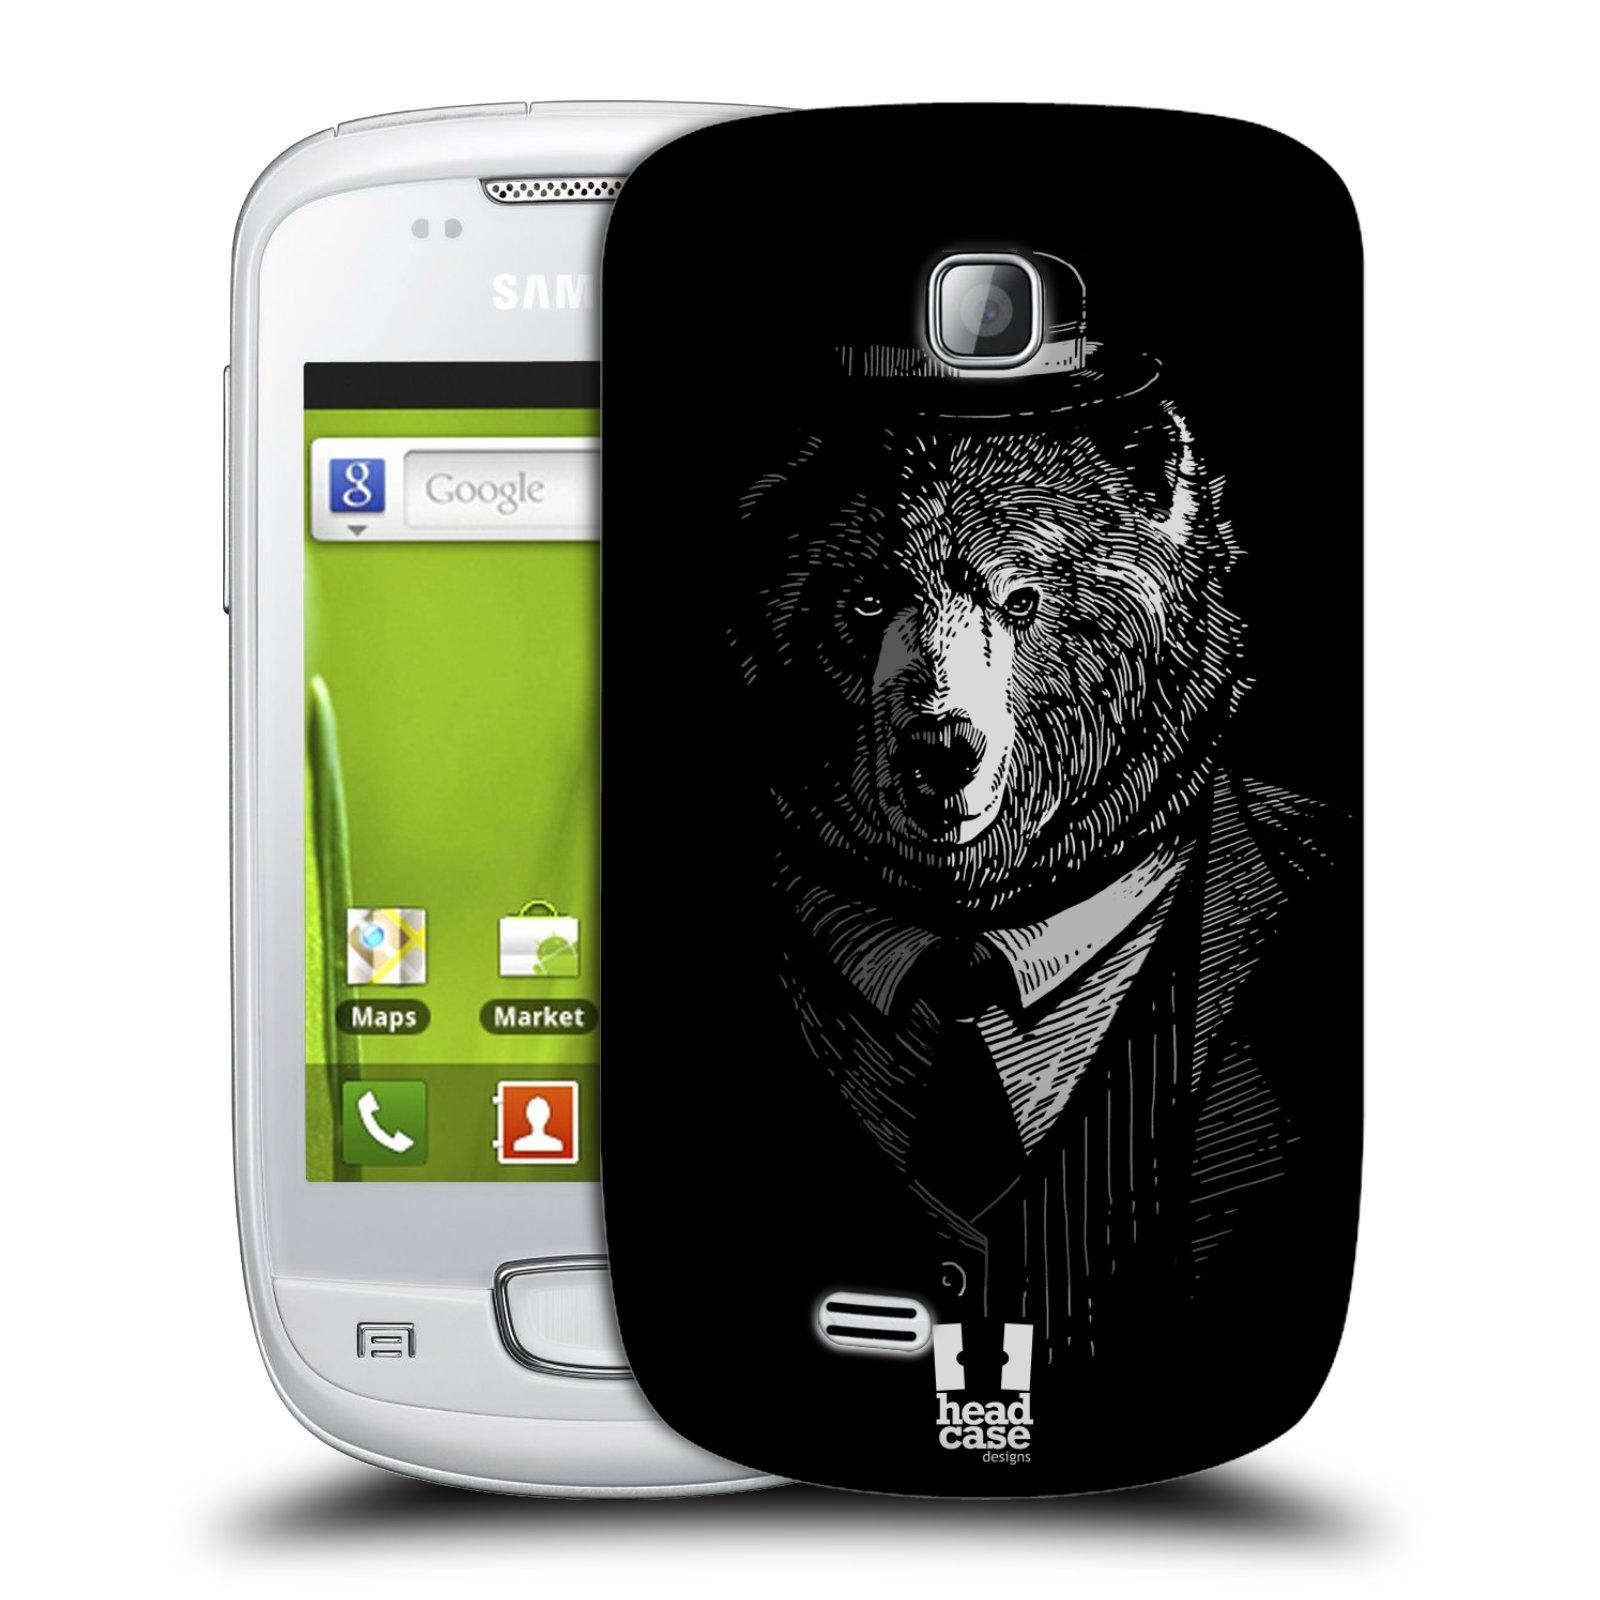 Plastové pouzdro na mobil Samsung Galaxy Mini HEAD CASE MEDVĚD V KVÁDRU (Kryt či obal na mobilní telefon Samsung Galaxy Mini GT-S5570 / GT-S5570i)